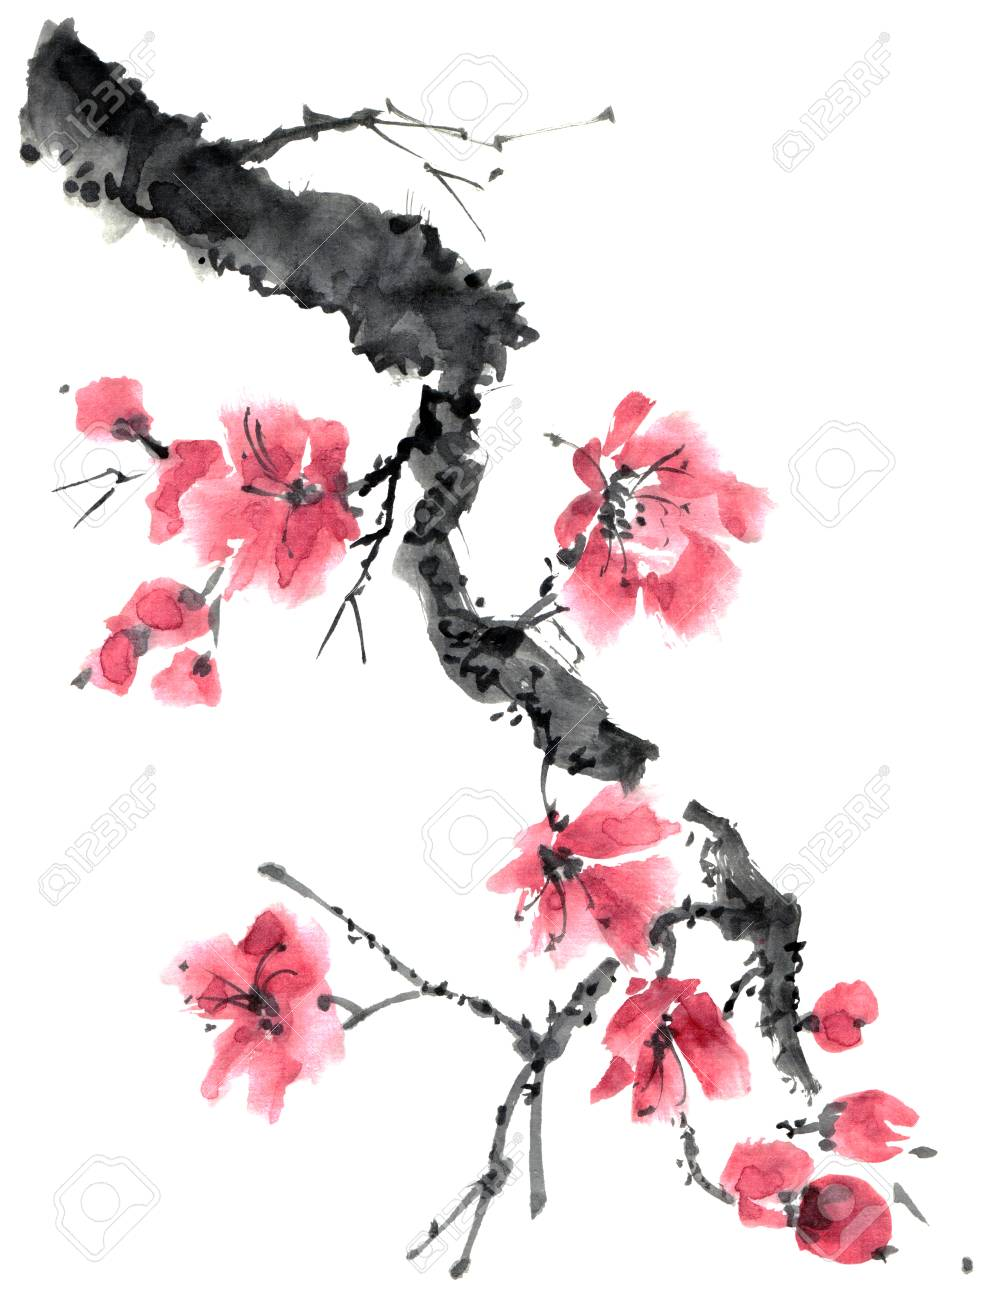 Watercolor And Ink Illustration Of Sakura Tree Branch With Pink Sakura Painting Sakura Tree Cherry Blossom Watercolor